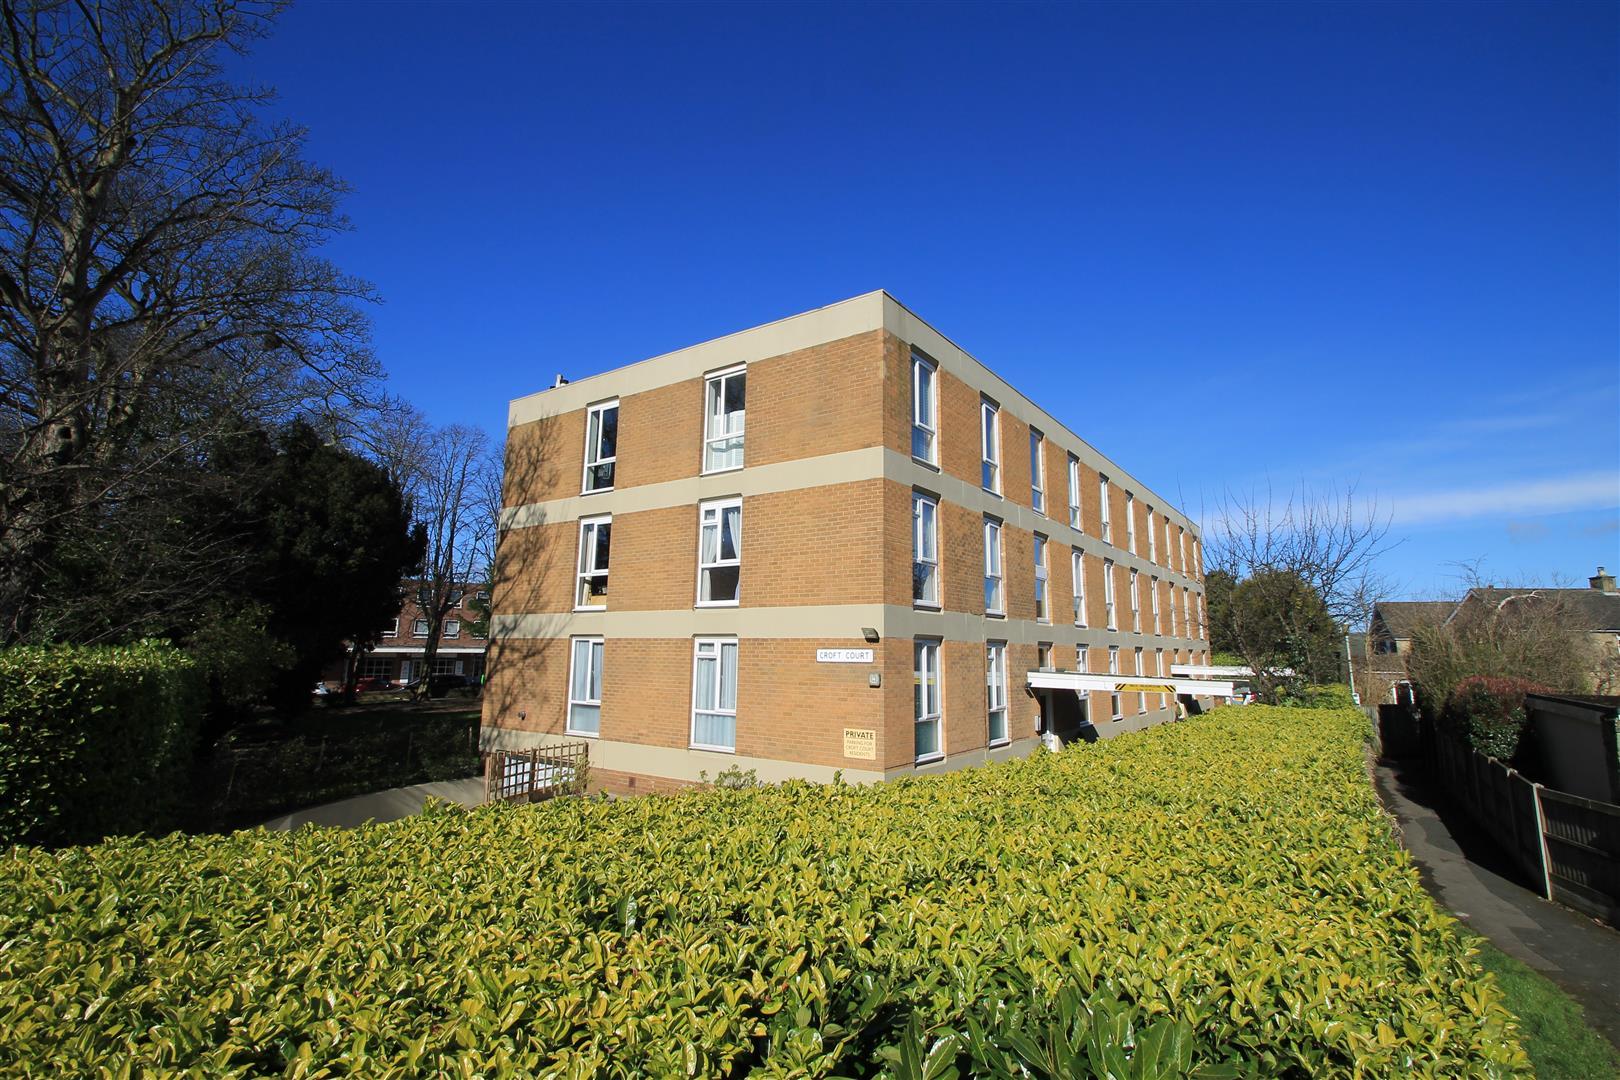 Croft court, Main Street, Menston, LS29 6LD